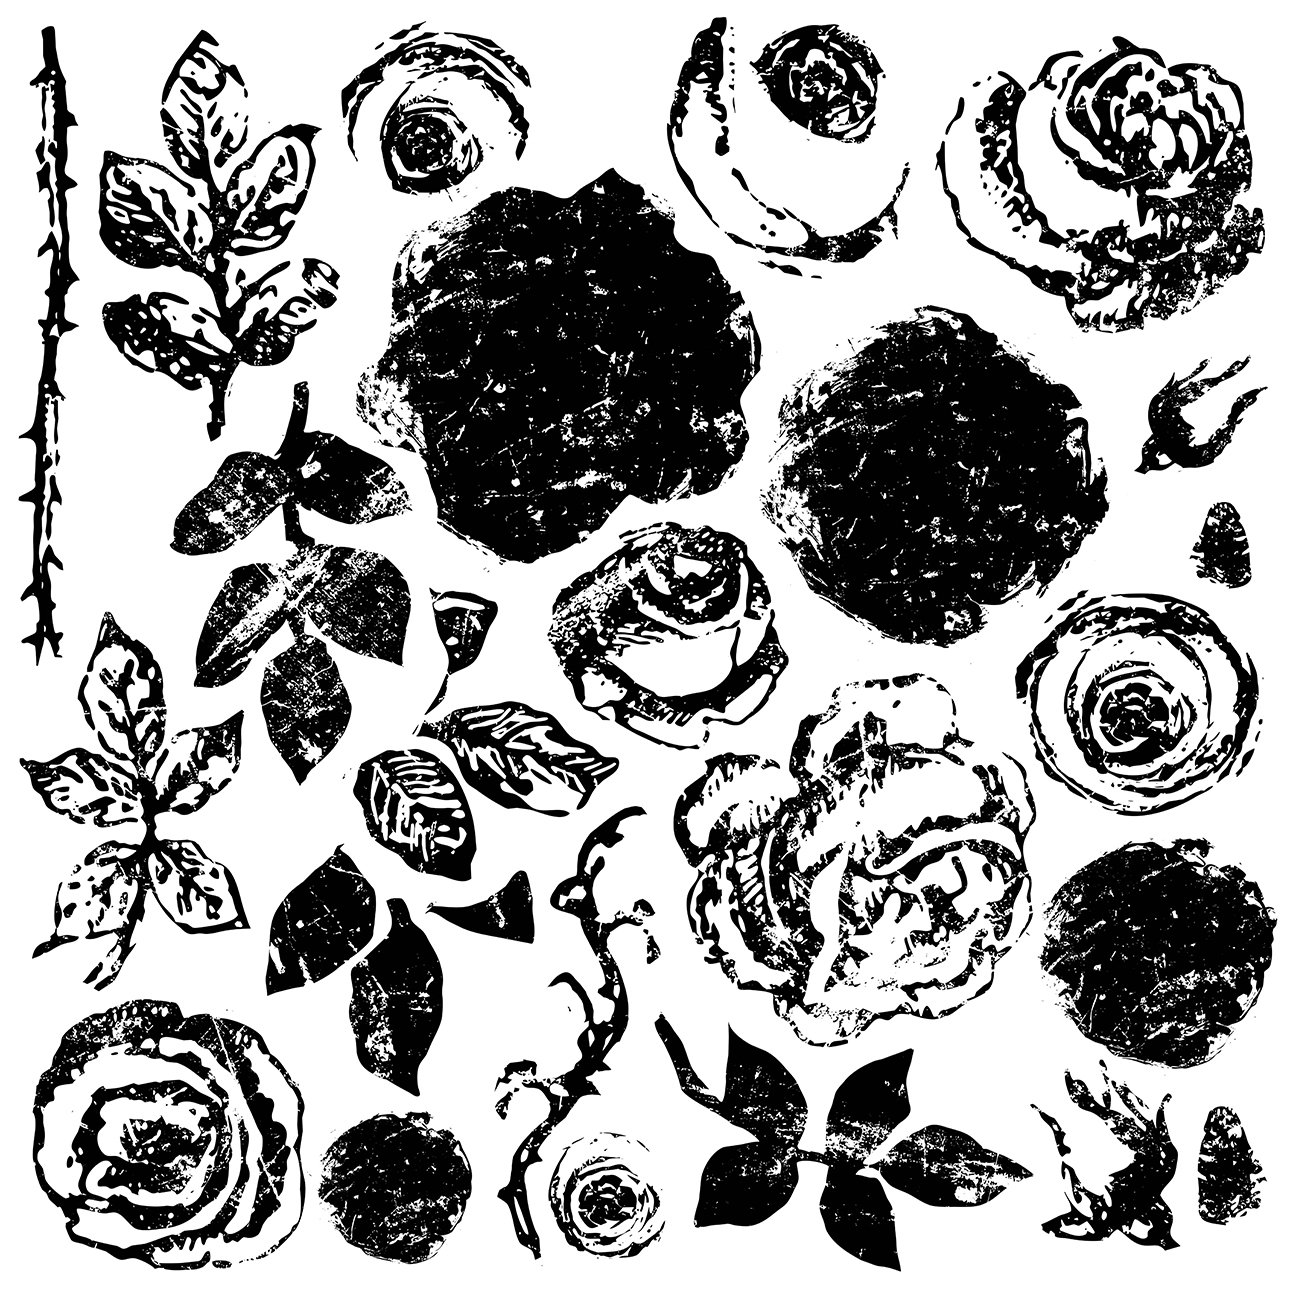 Painterly Roses 12 x 12 IOD Decor Stamp Retired Jan 2021